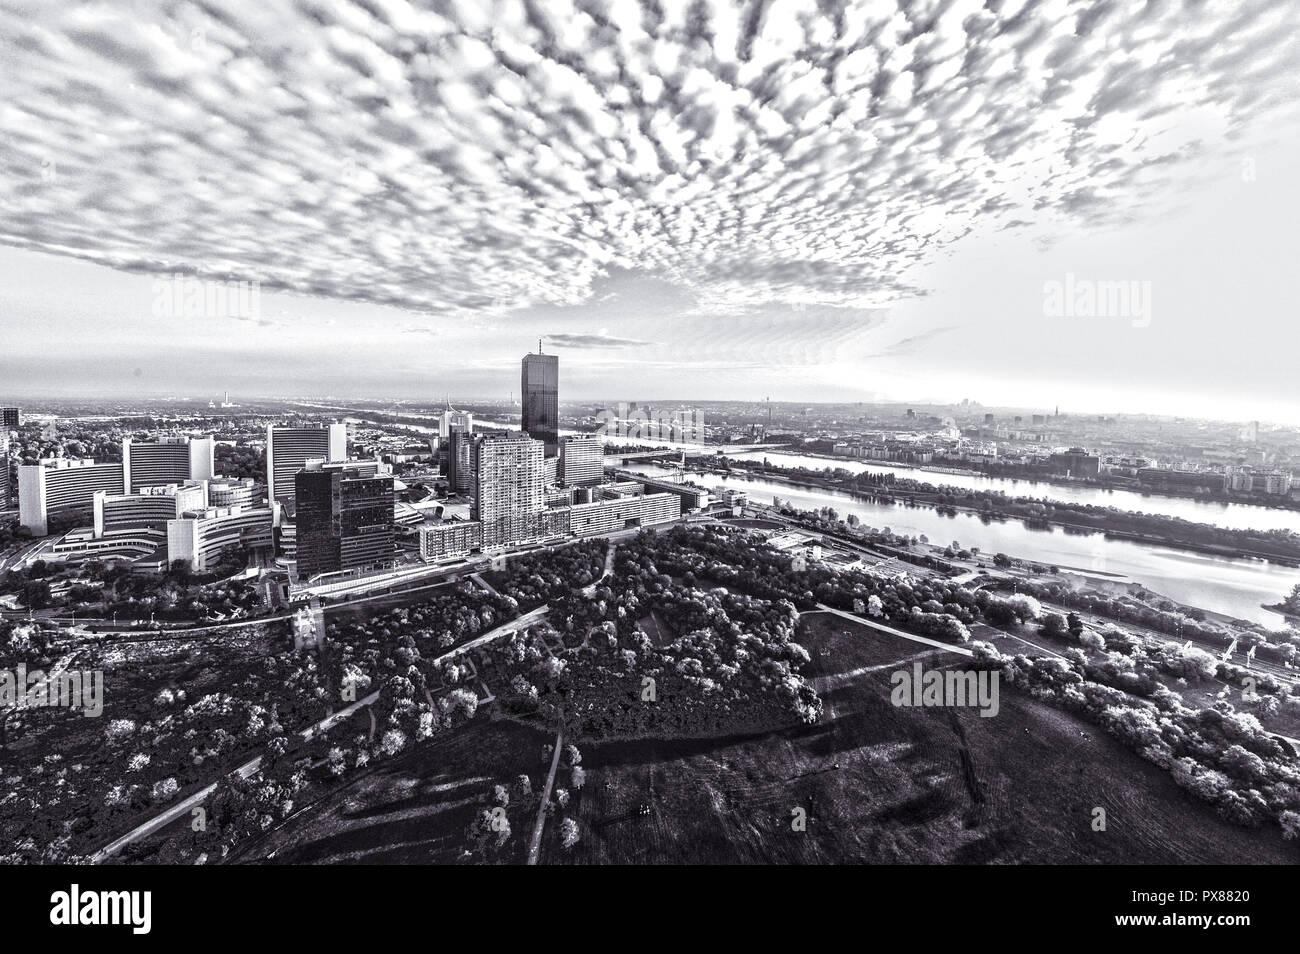 Vienna, skyline, Danube city, DC Tower 1, 2013, highest building of Vienna, 250 m, architect Dominique Perrault, Austria, 22. District, Donaucity - Stock Image